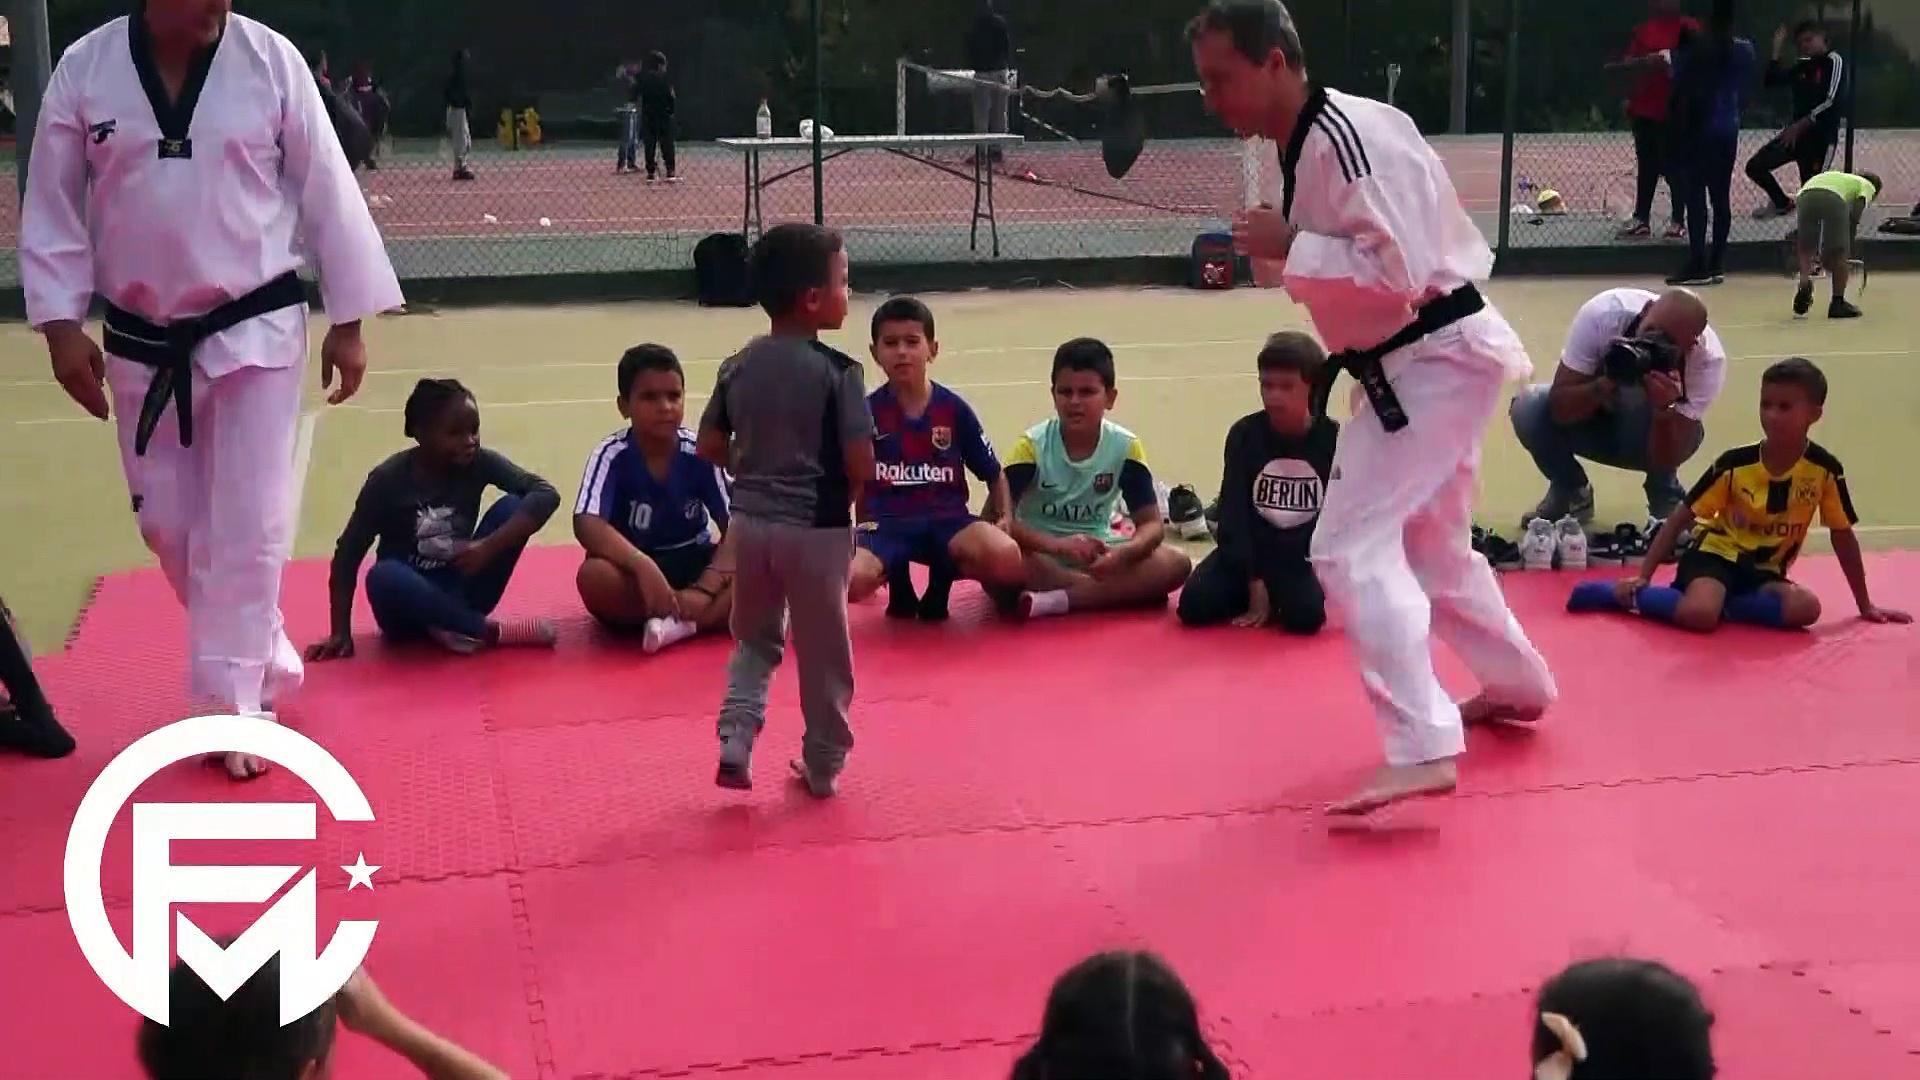 Insolite : Quand Eyraud enfile son kimono de Taekwondo ce matin...